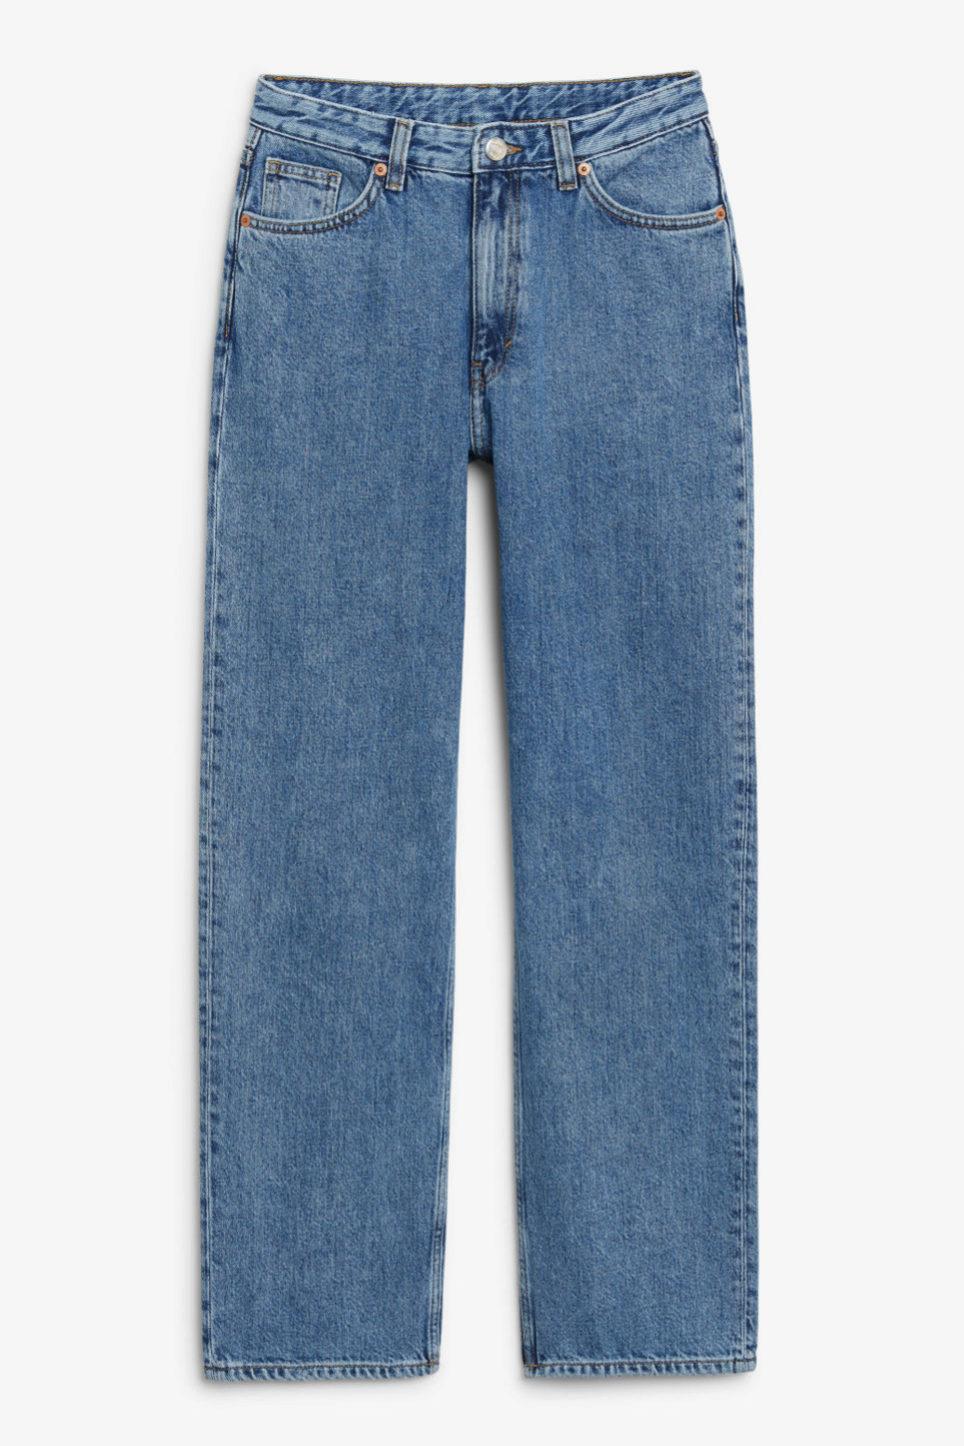 Jeans desgastados de Monki